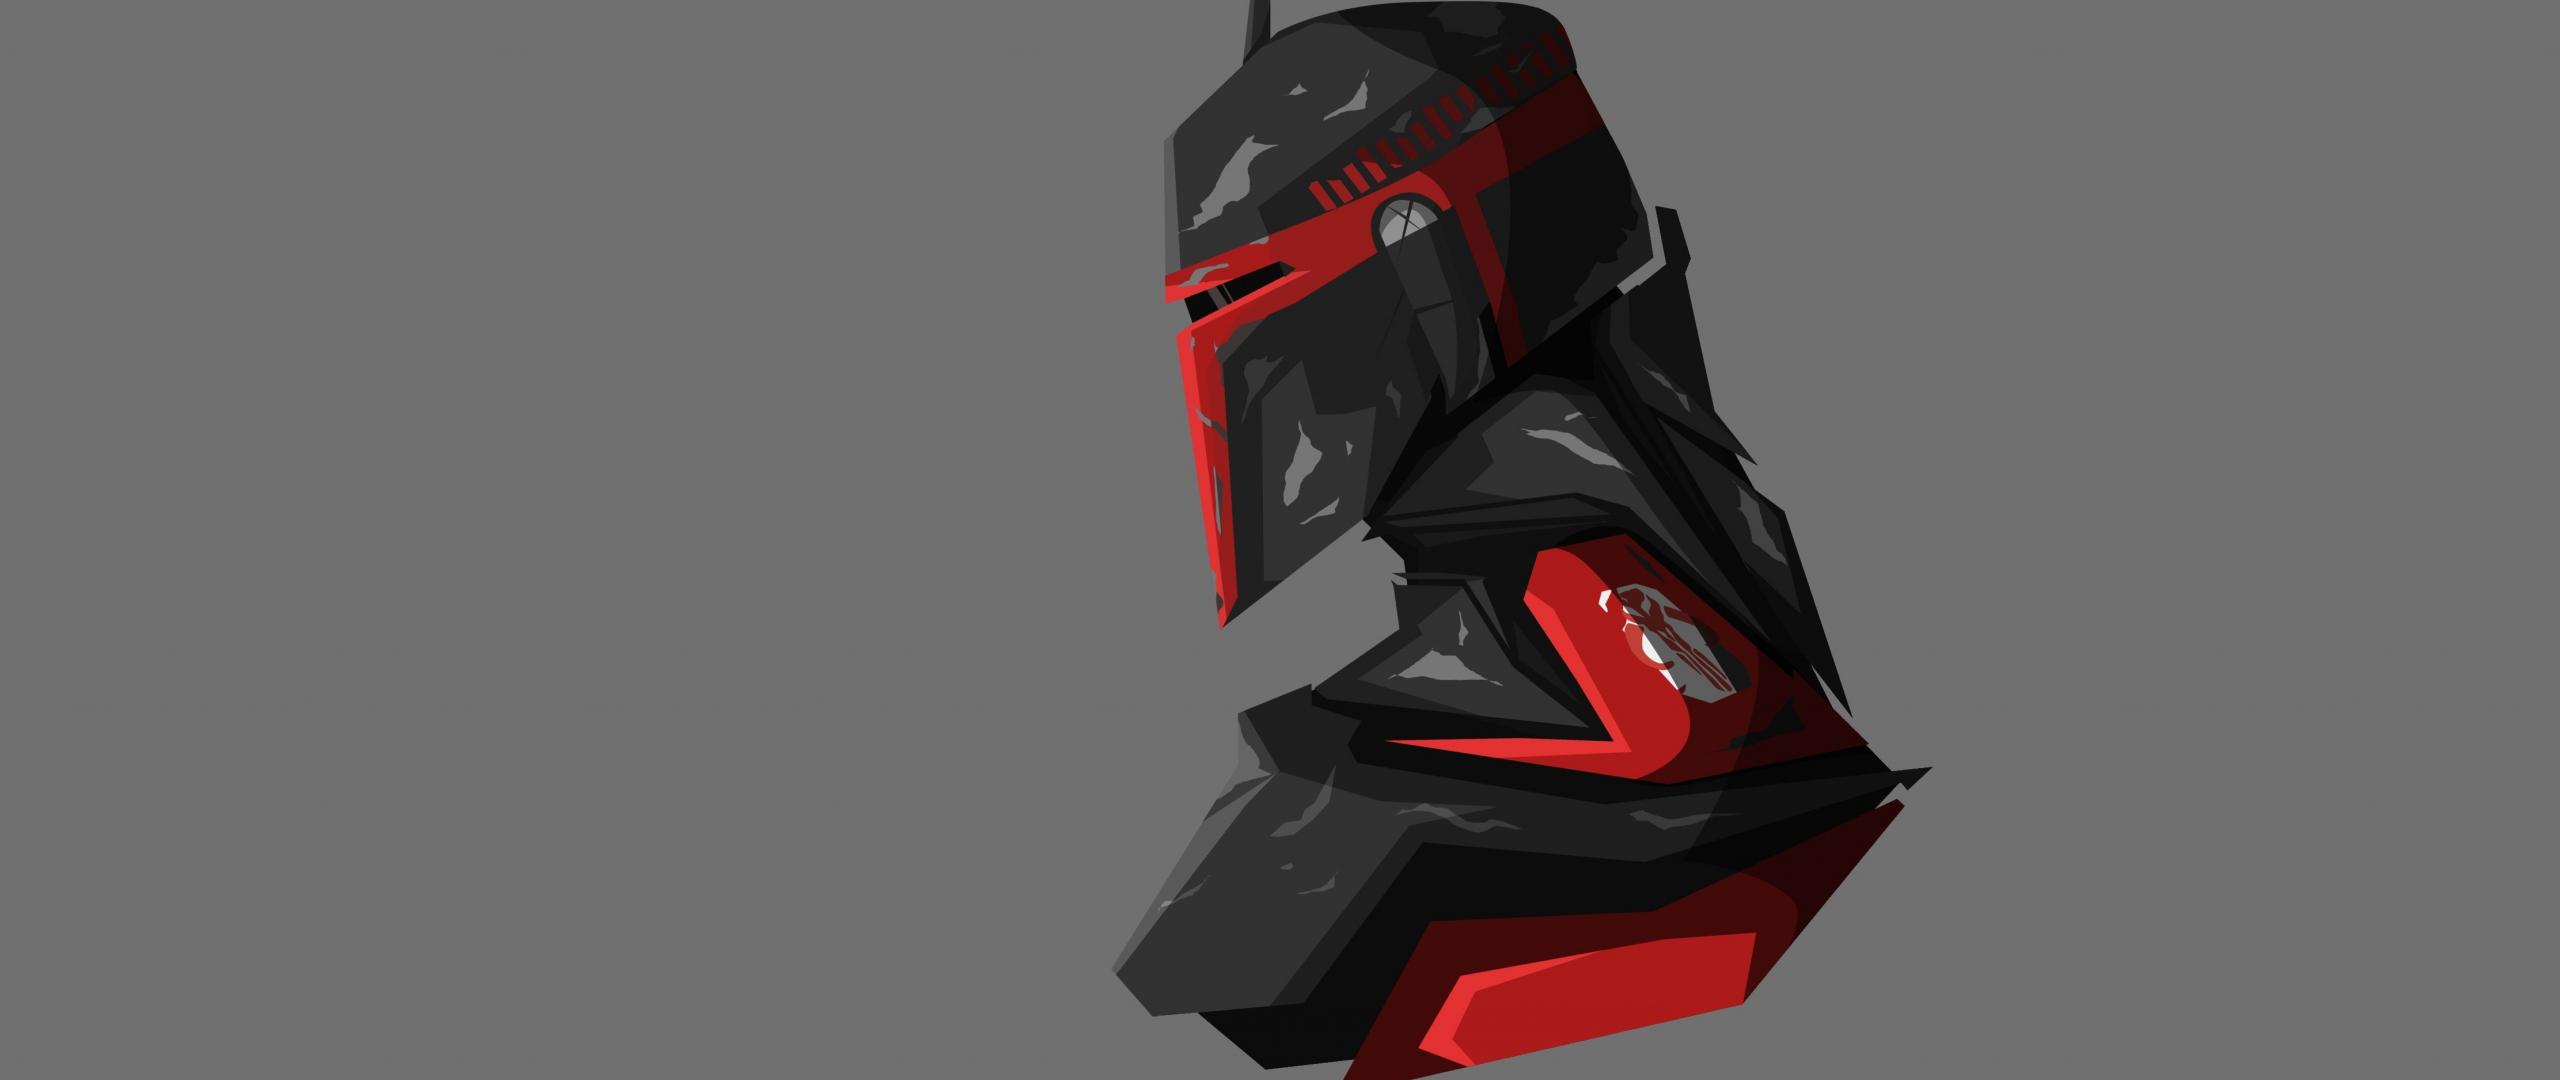 Download 2560x1080 Wallpaper Boba Fett Star Wars Captain Art